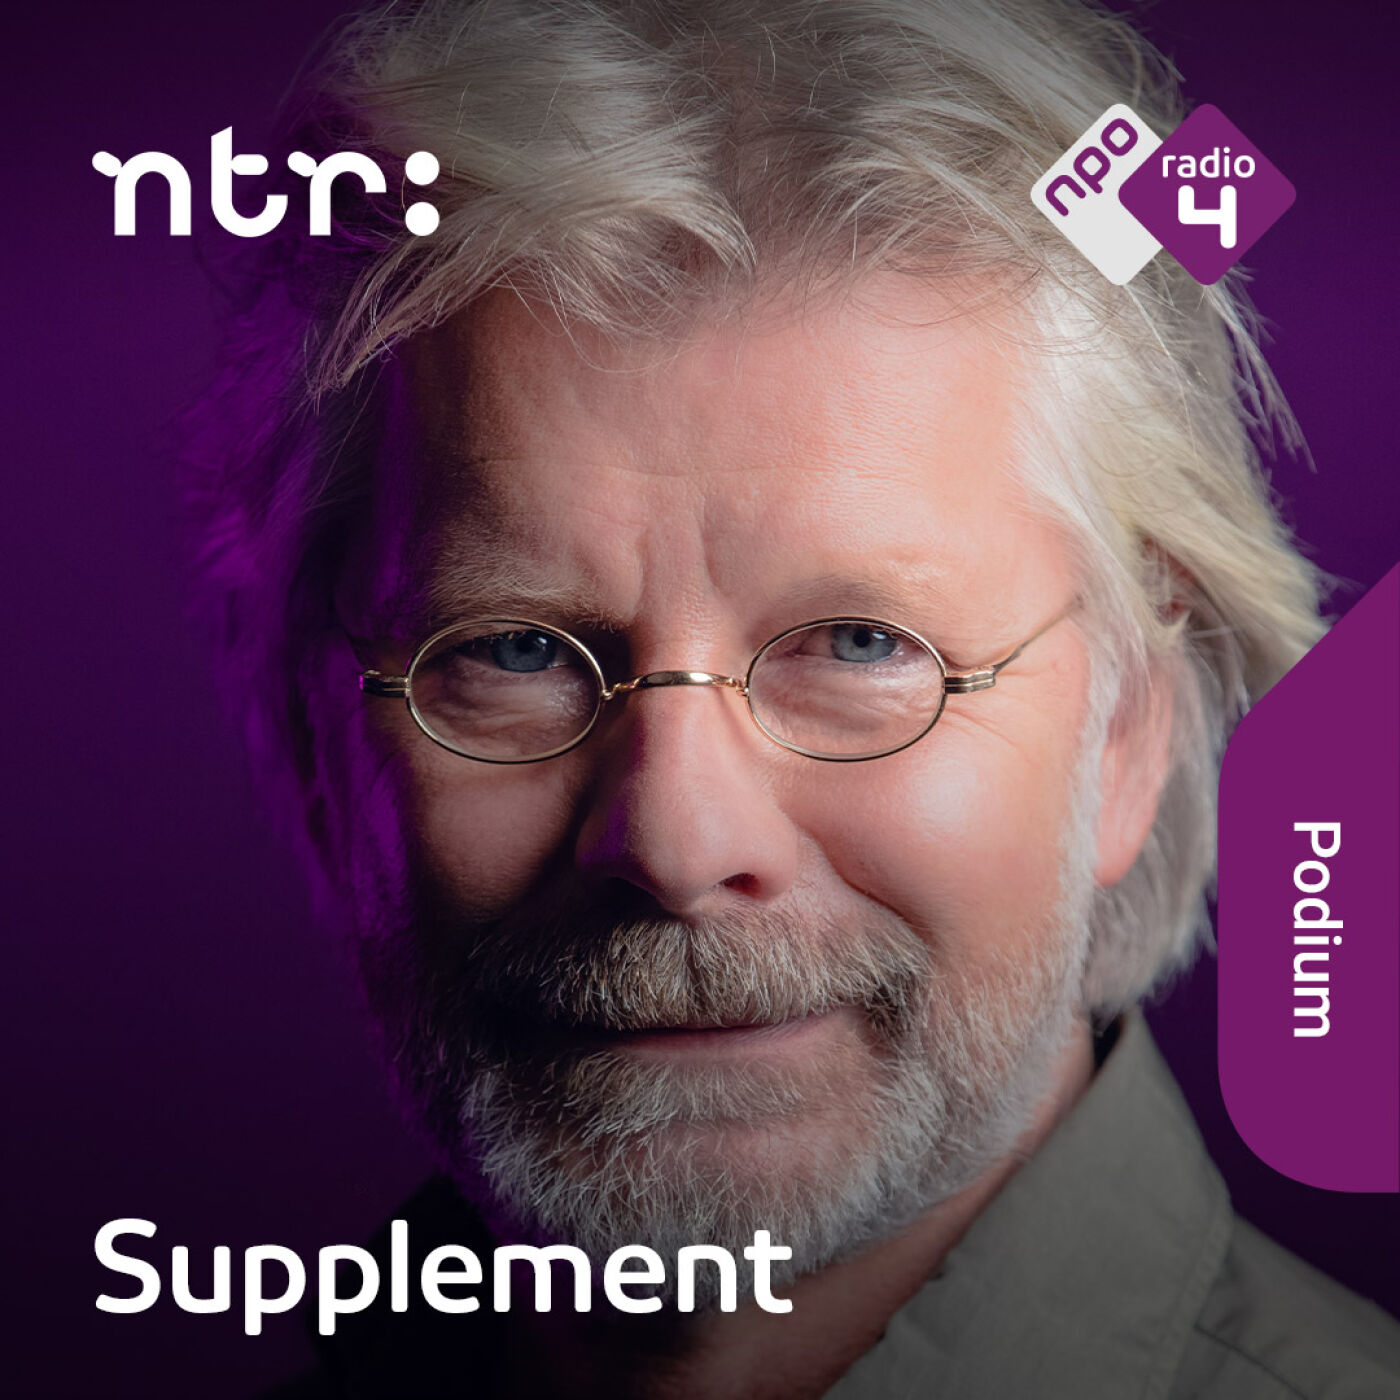 Supplement logo